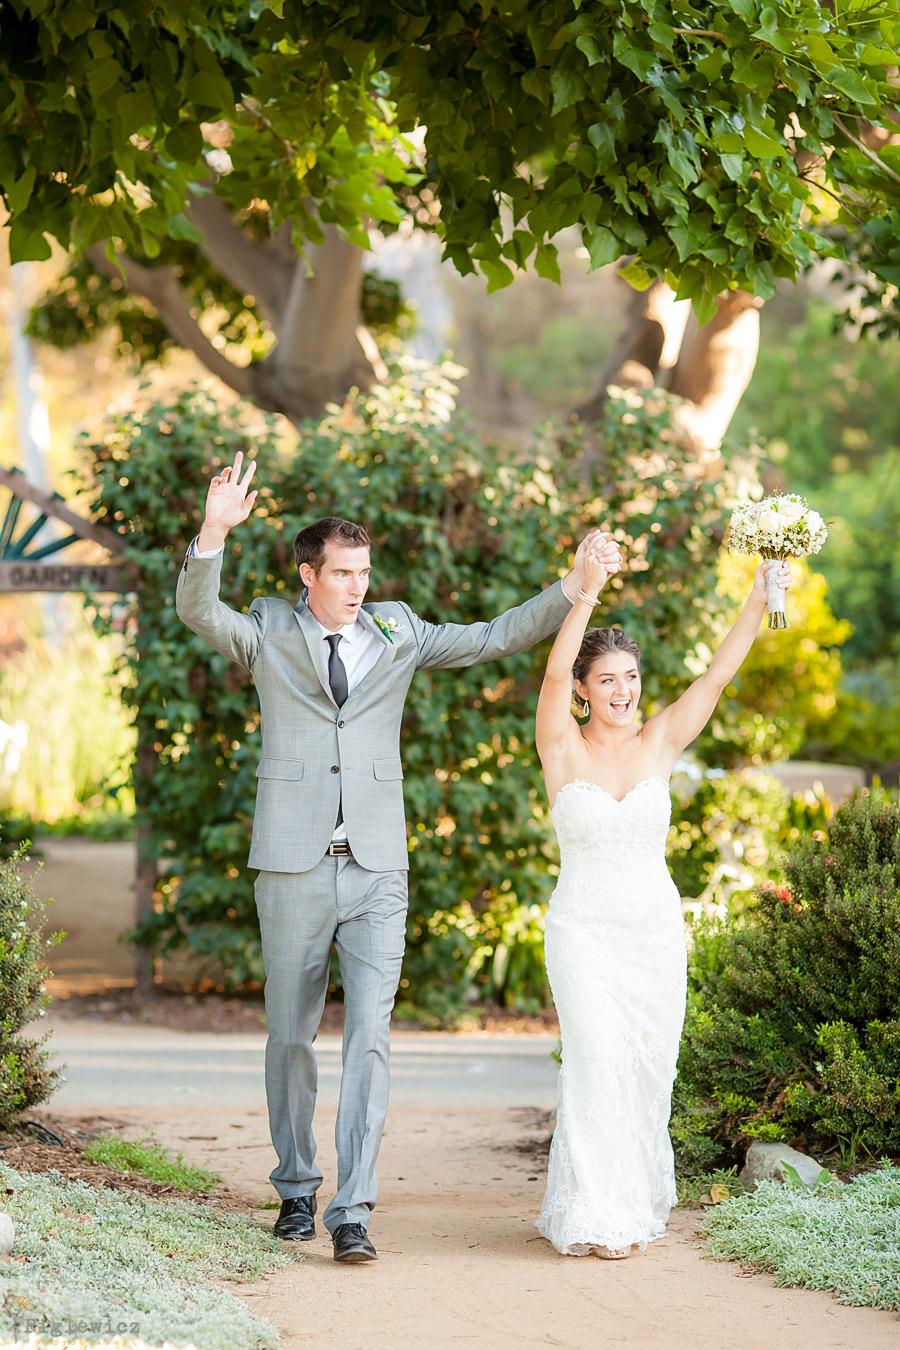 South Coast Botanic Gardens Wedding Palos Verdes Diana Pat Part 2 Figlewicz